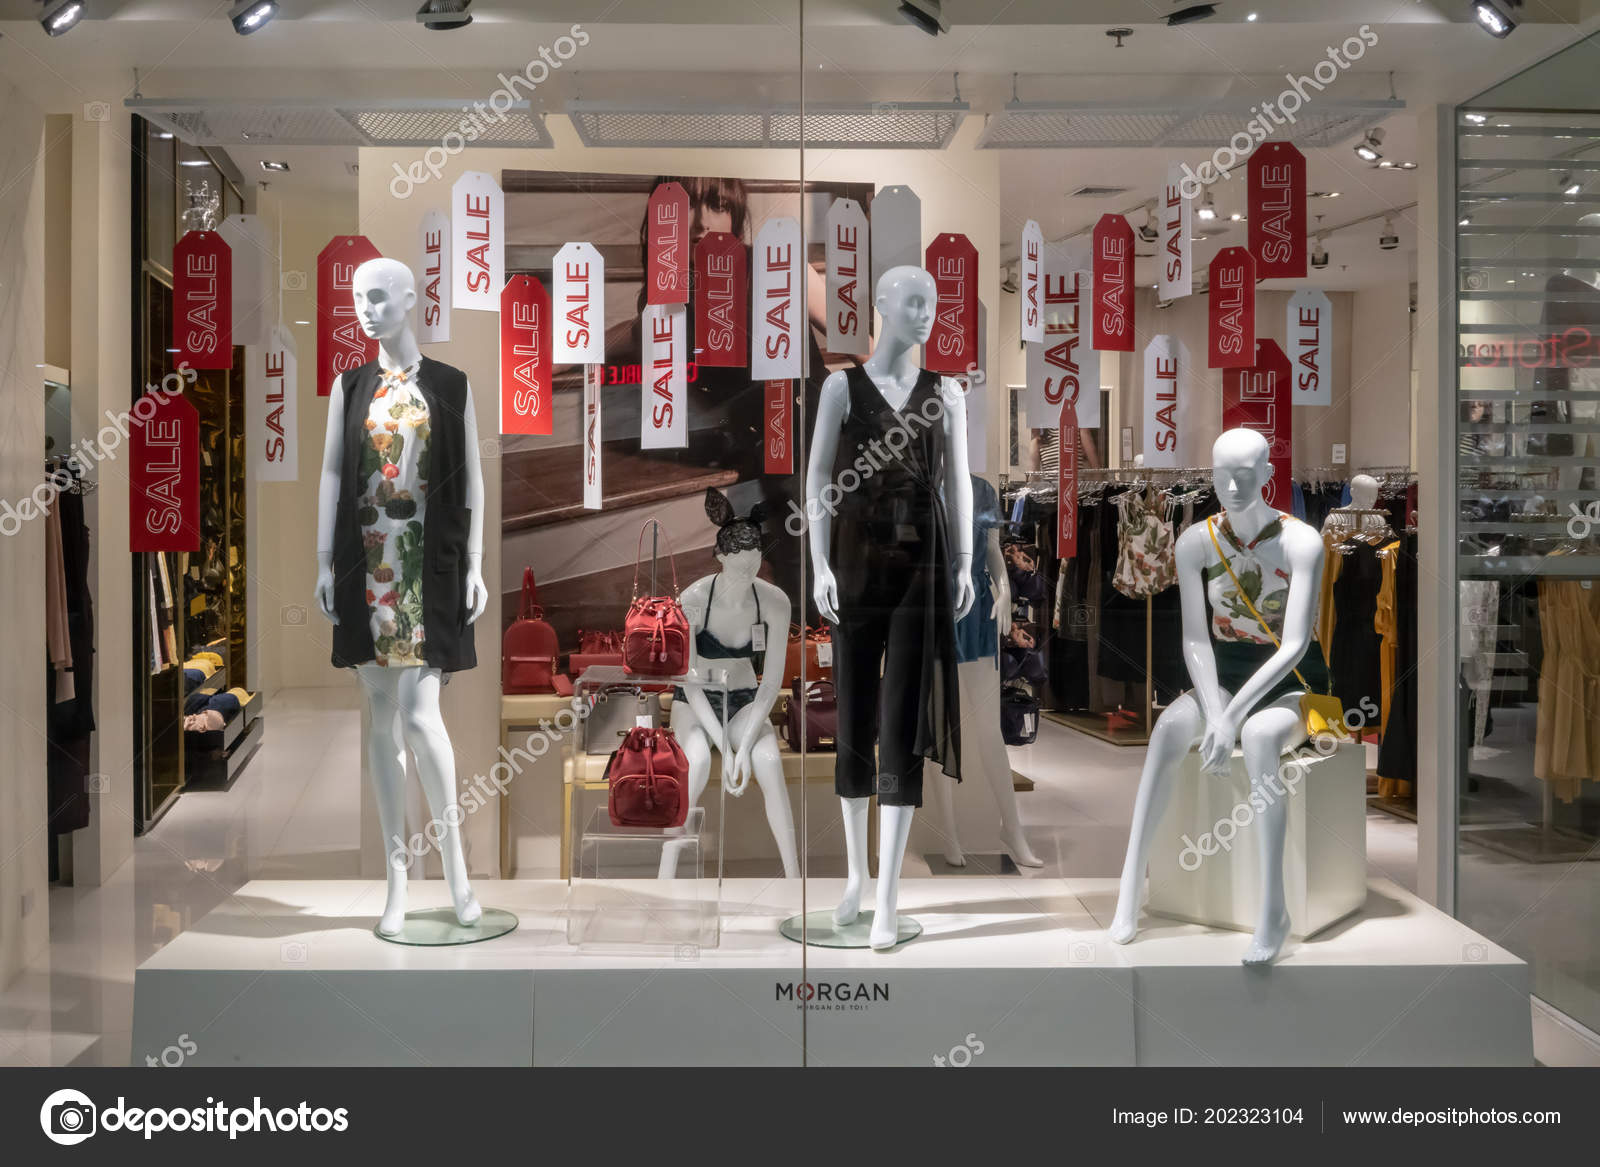 newest 49490 7fadb Morgan Shop Unter Emquatier Bangkok Thailand Juni 2018 Luxus ...